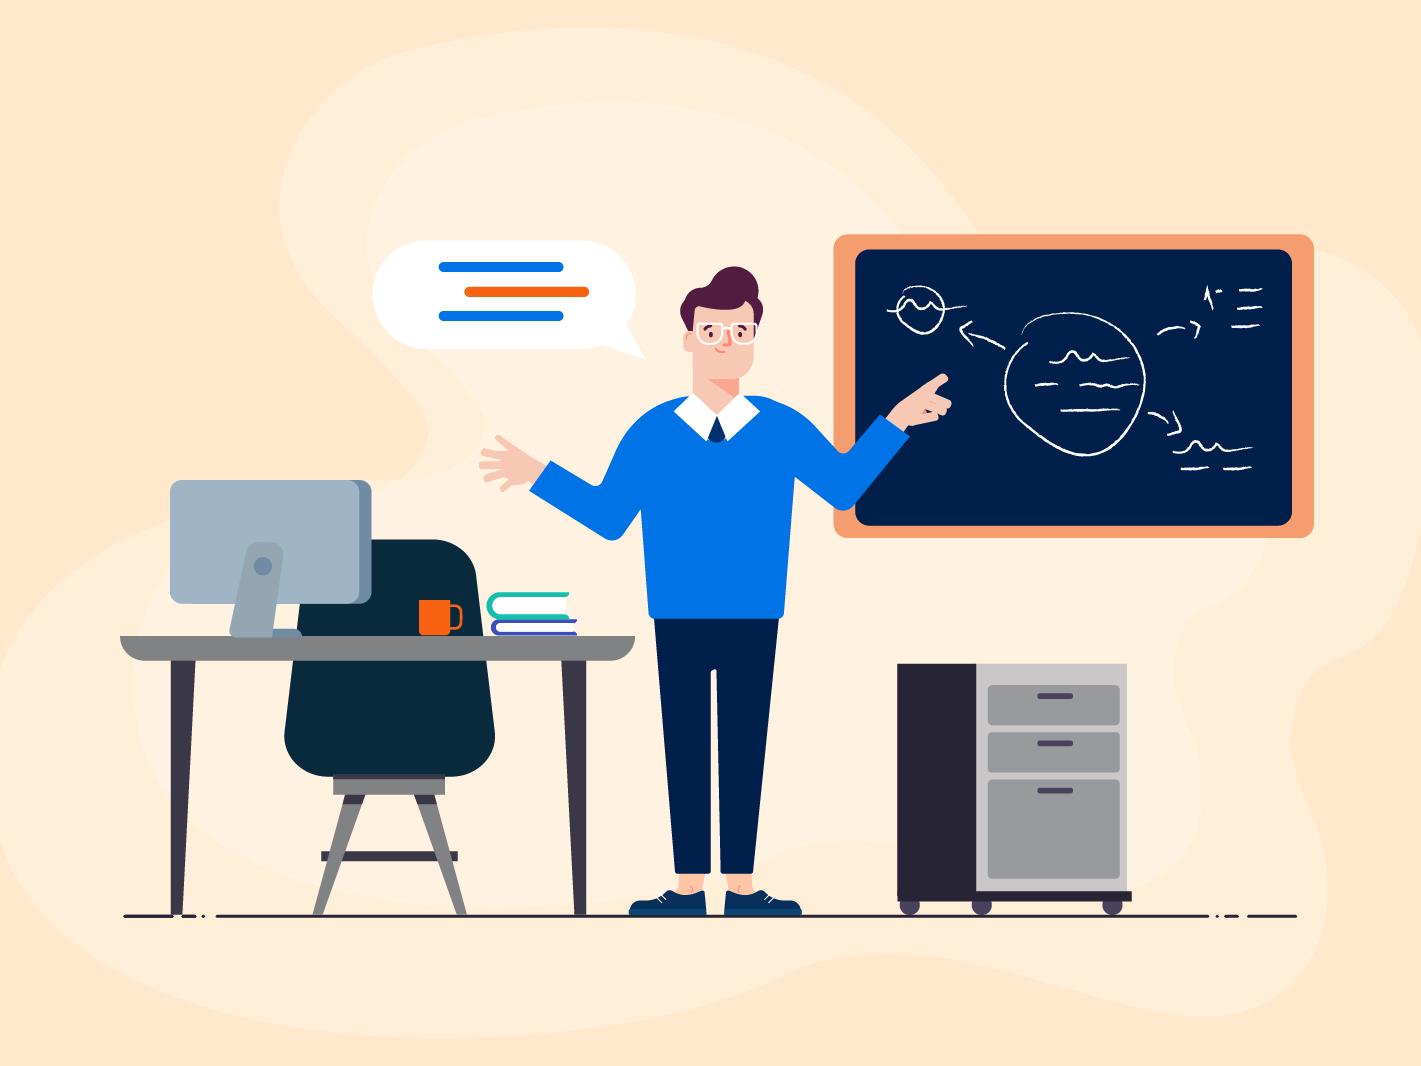 Teacher education app educational hub education teacher classroom illustration explainer character 2d art